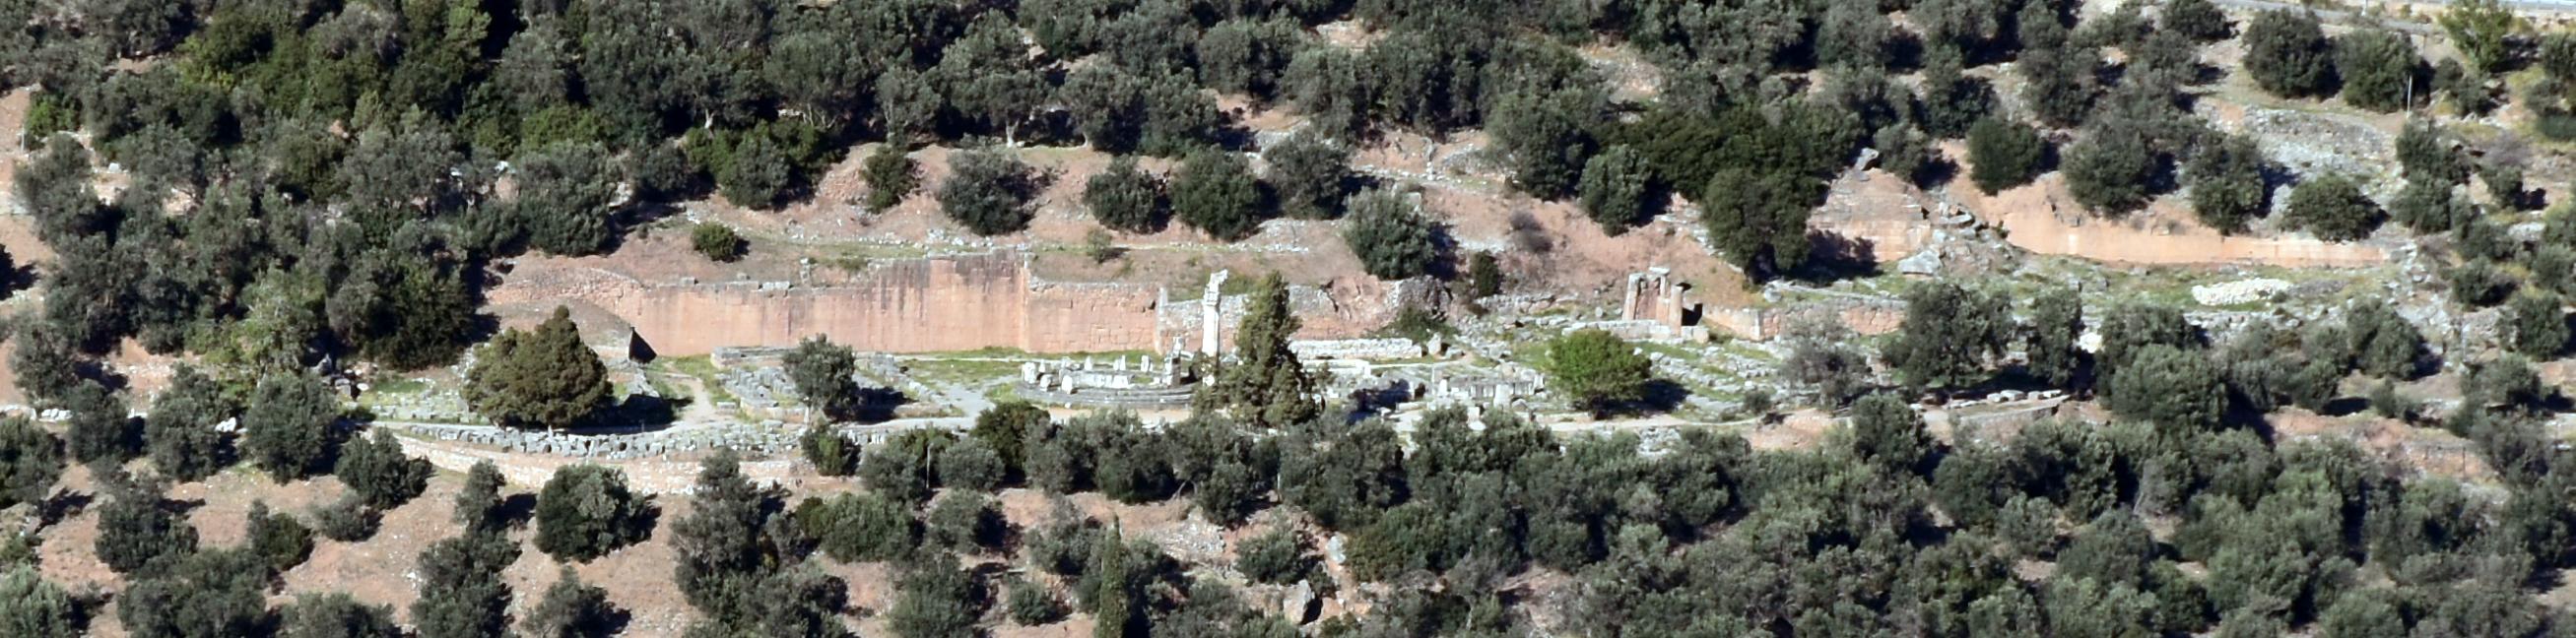 La terrasse de Marmaria vue depuis le Sud © EFA/Mission Delphes-Marmaria